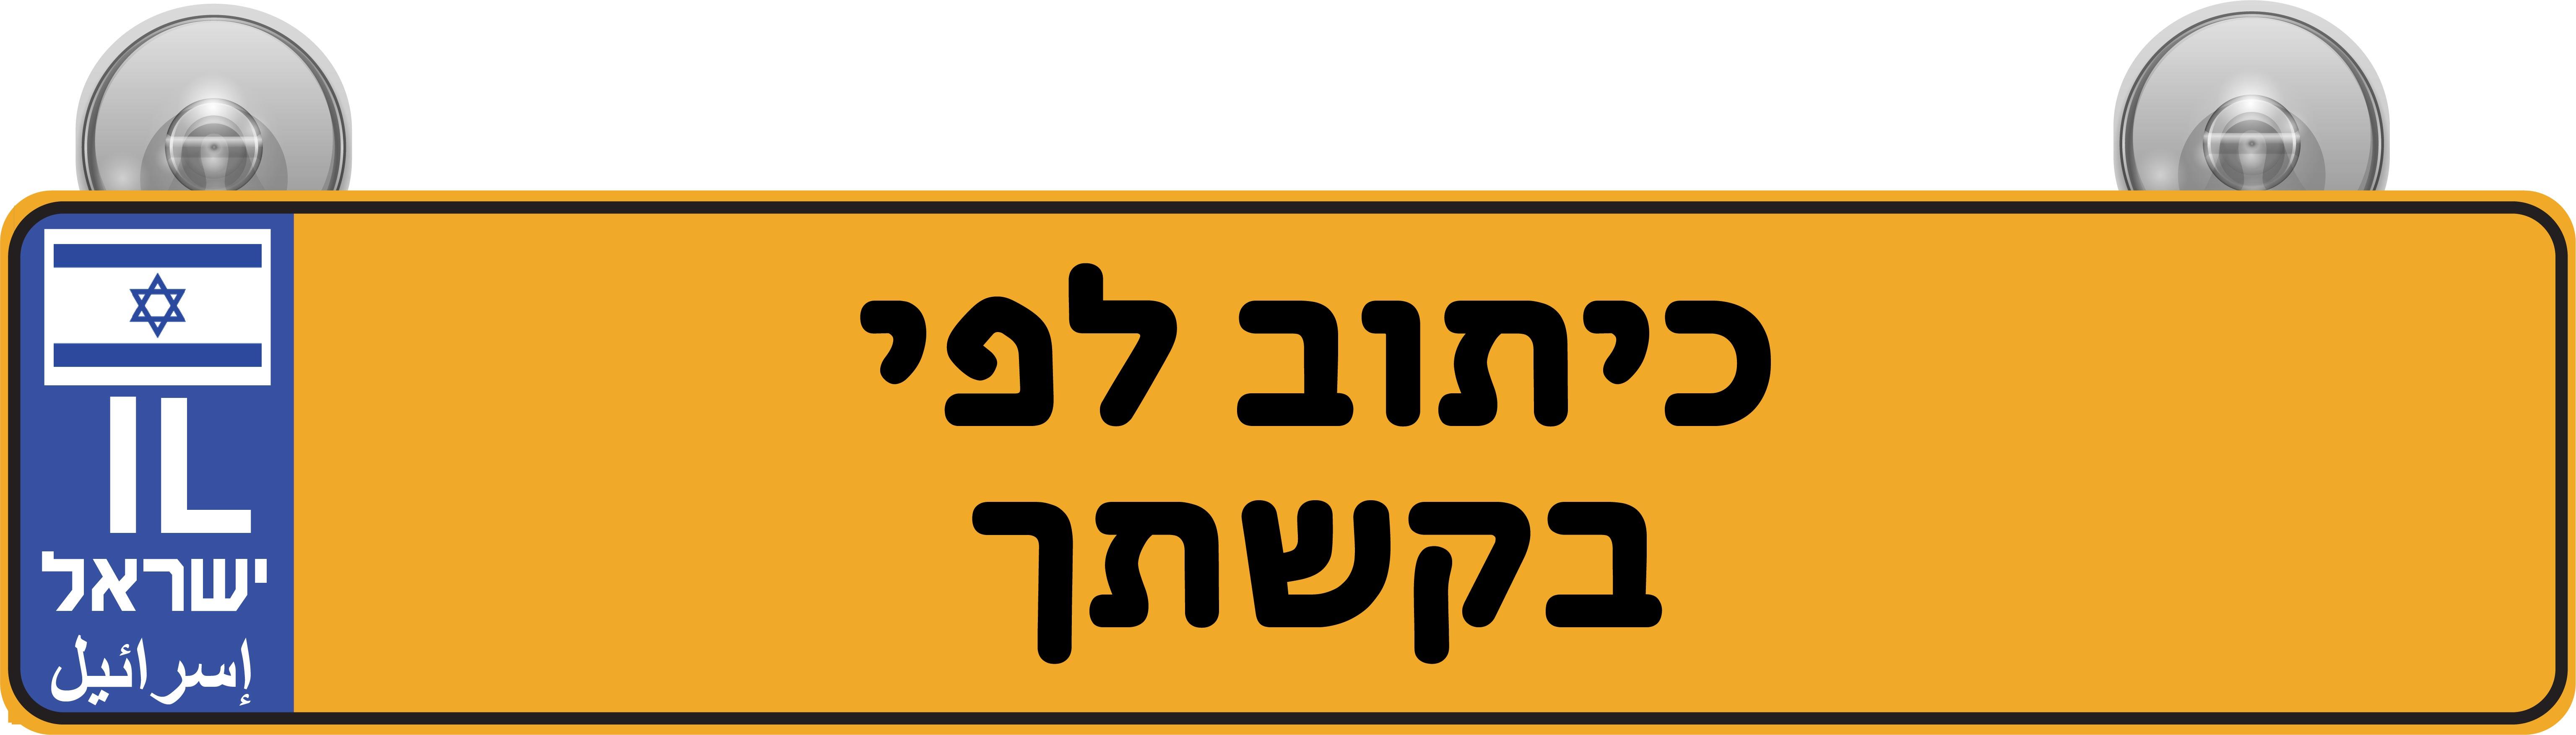 G1012 לוחית רישוי צהובה עם דגל 11/52 ס''מ + 2 פומיות גדולות 60 מ''מ